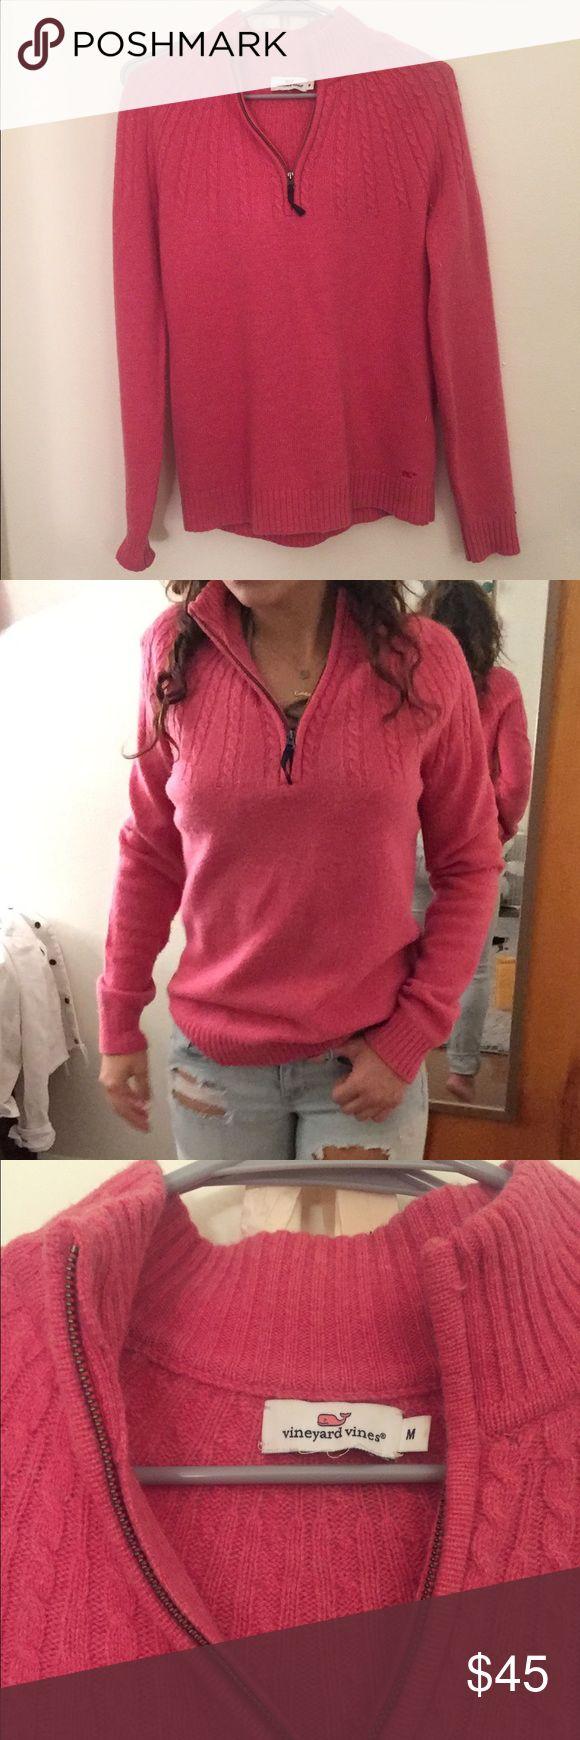 VINEYARD VINES CASHMERE SWEATER 3/4 zip pink colored sweater from Vineyard Vines. Thin, cashmere material. Very warm & super cute. Vineyard Vines Sweaters